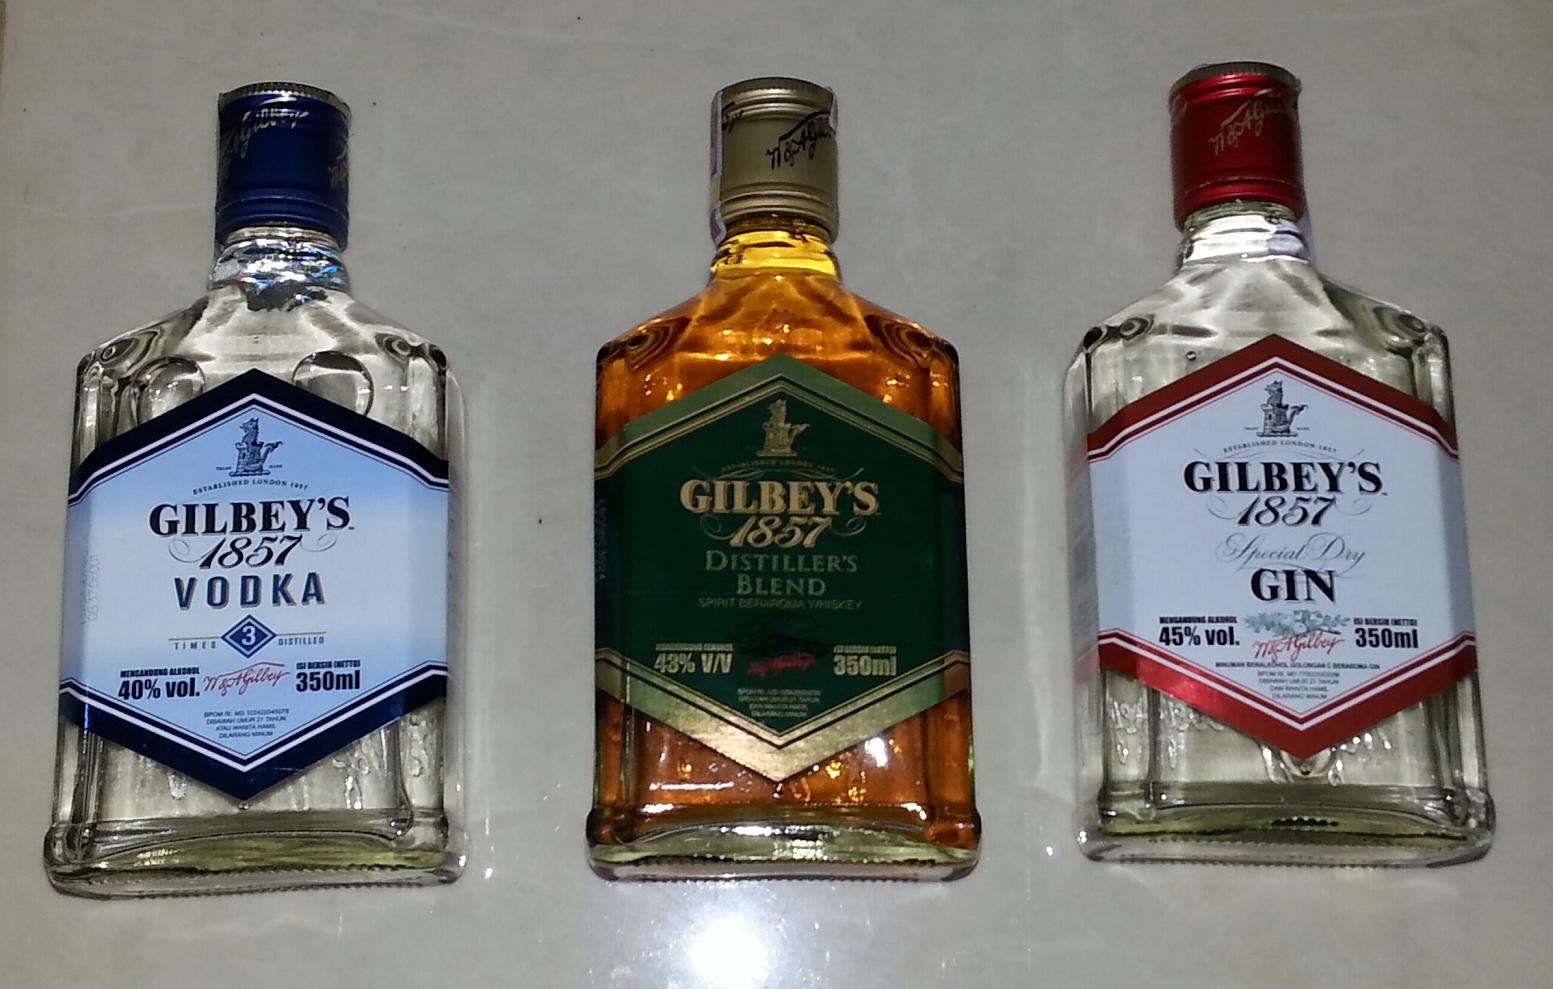 harga minuman beralkohohol pangandaran harga minuman beralkohol ...